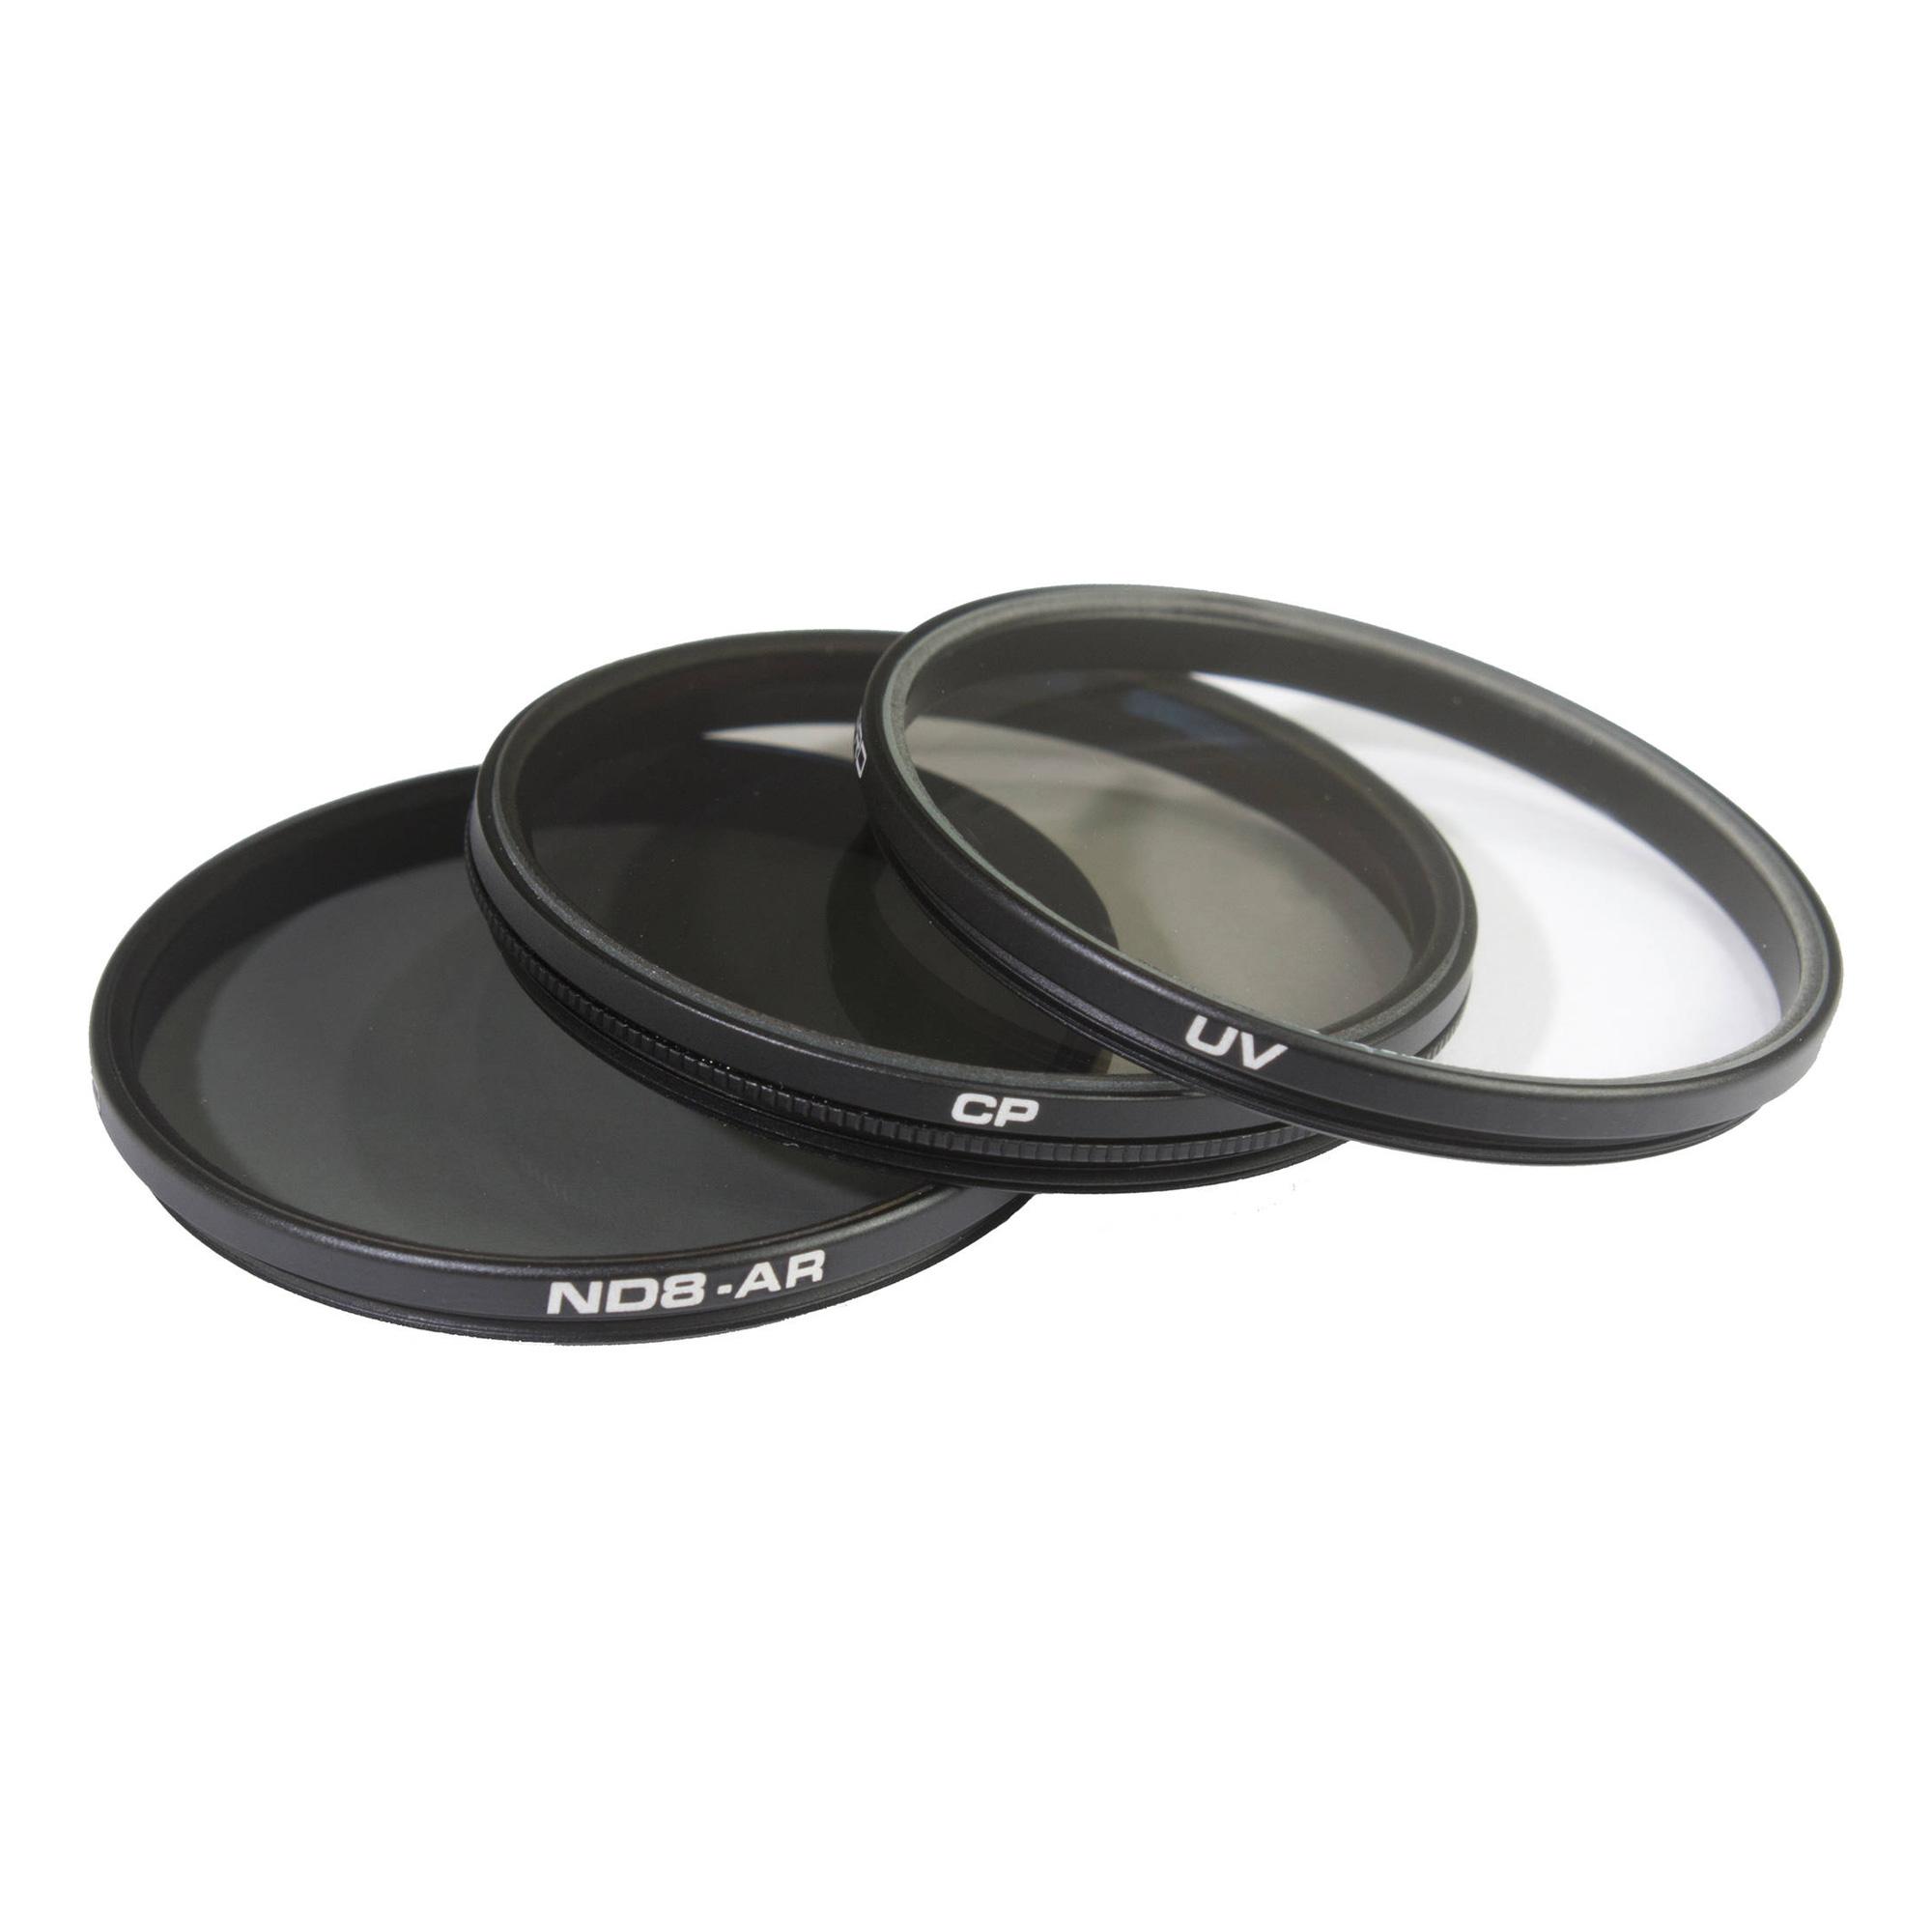 DJI Zenmuse X5/X5R Filters 3 Pack